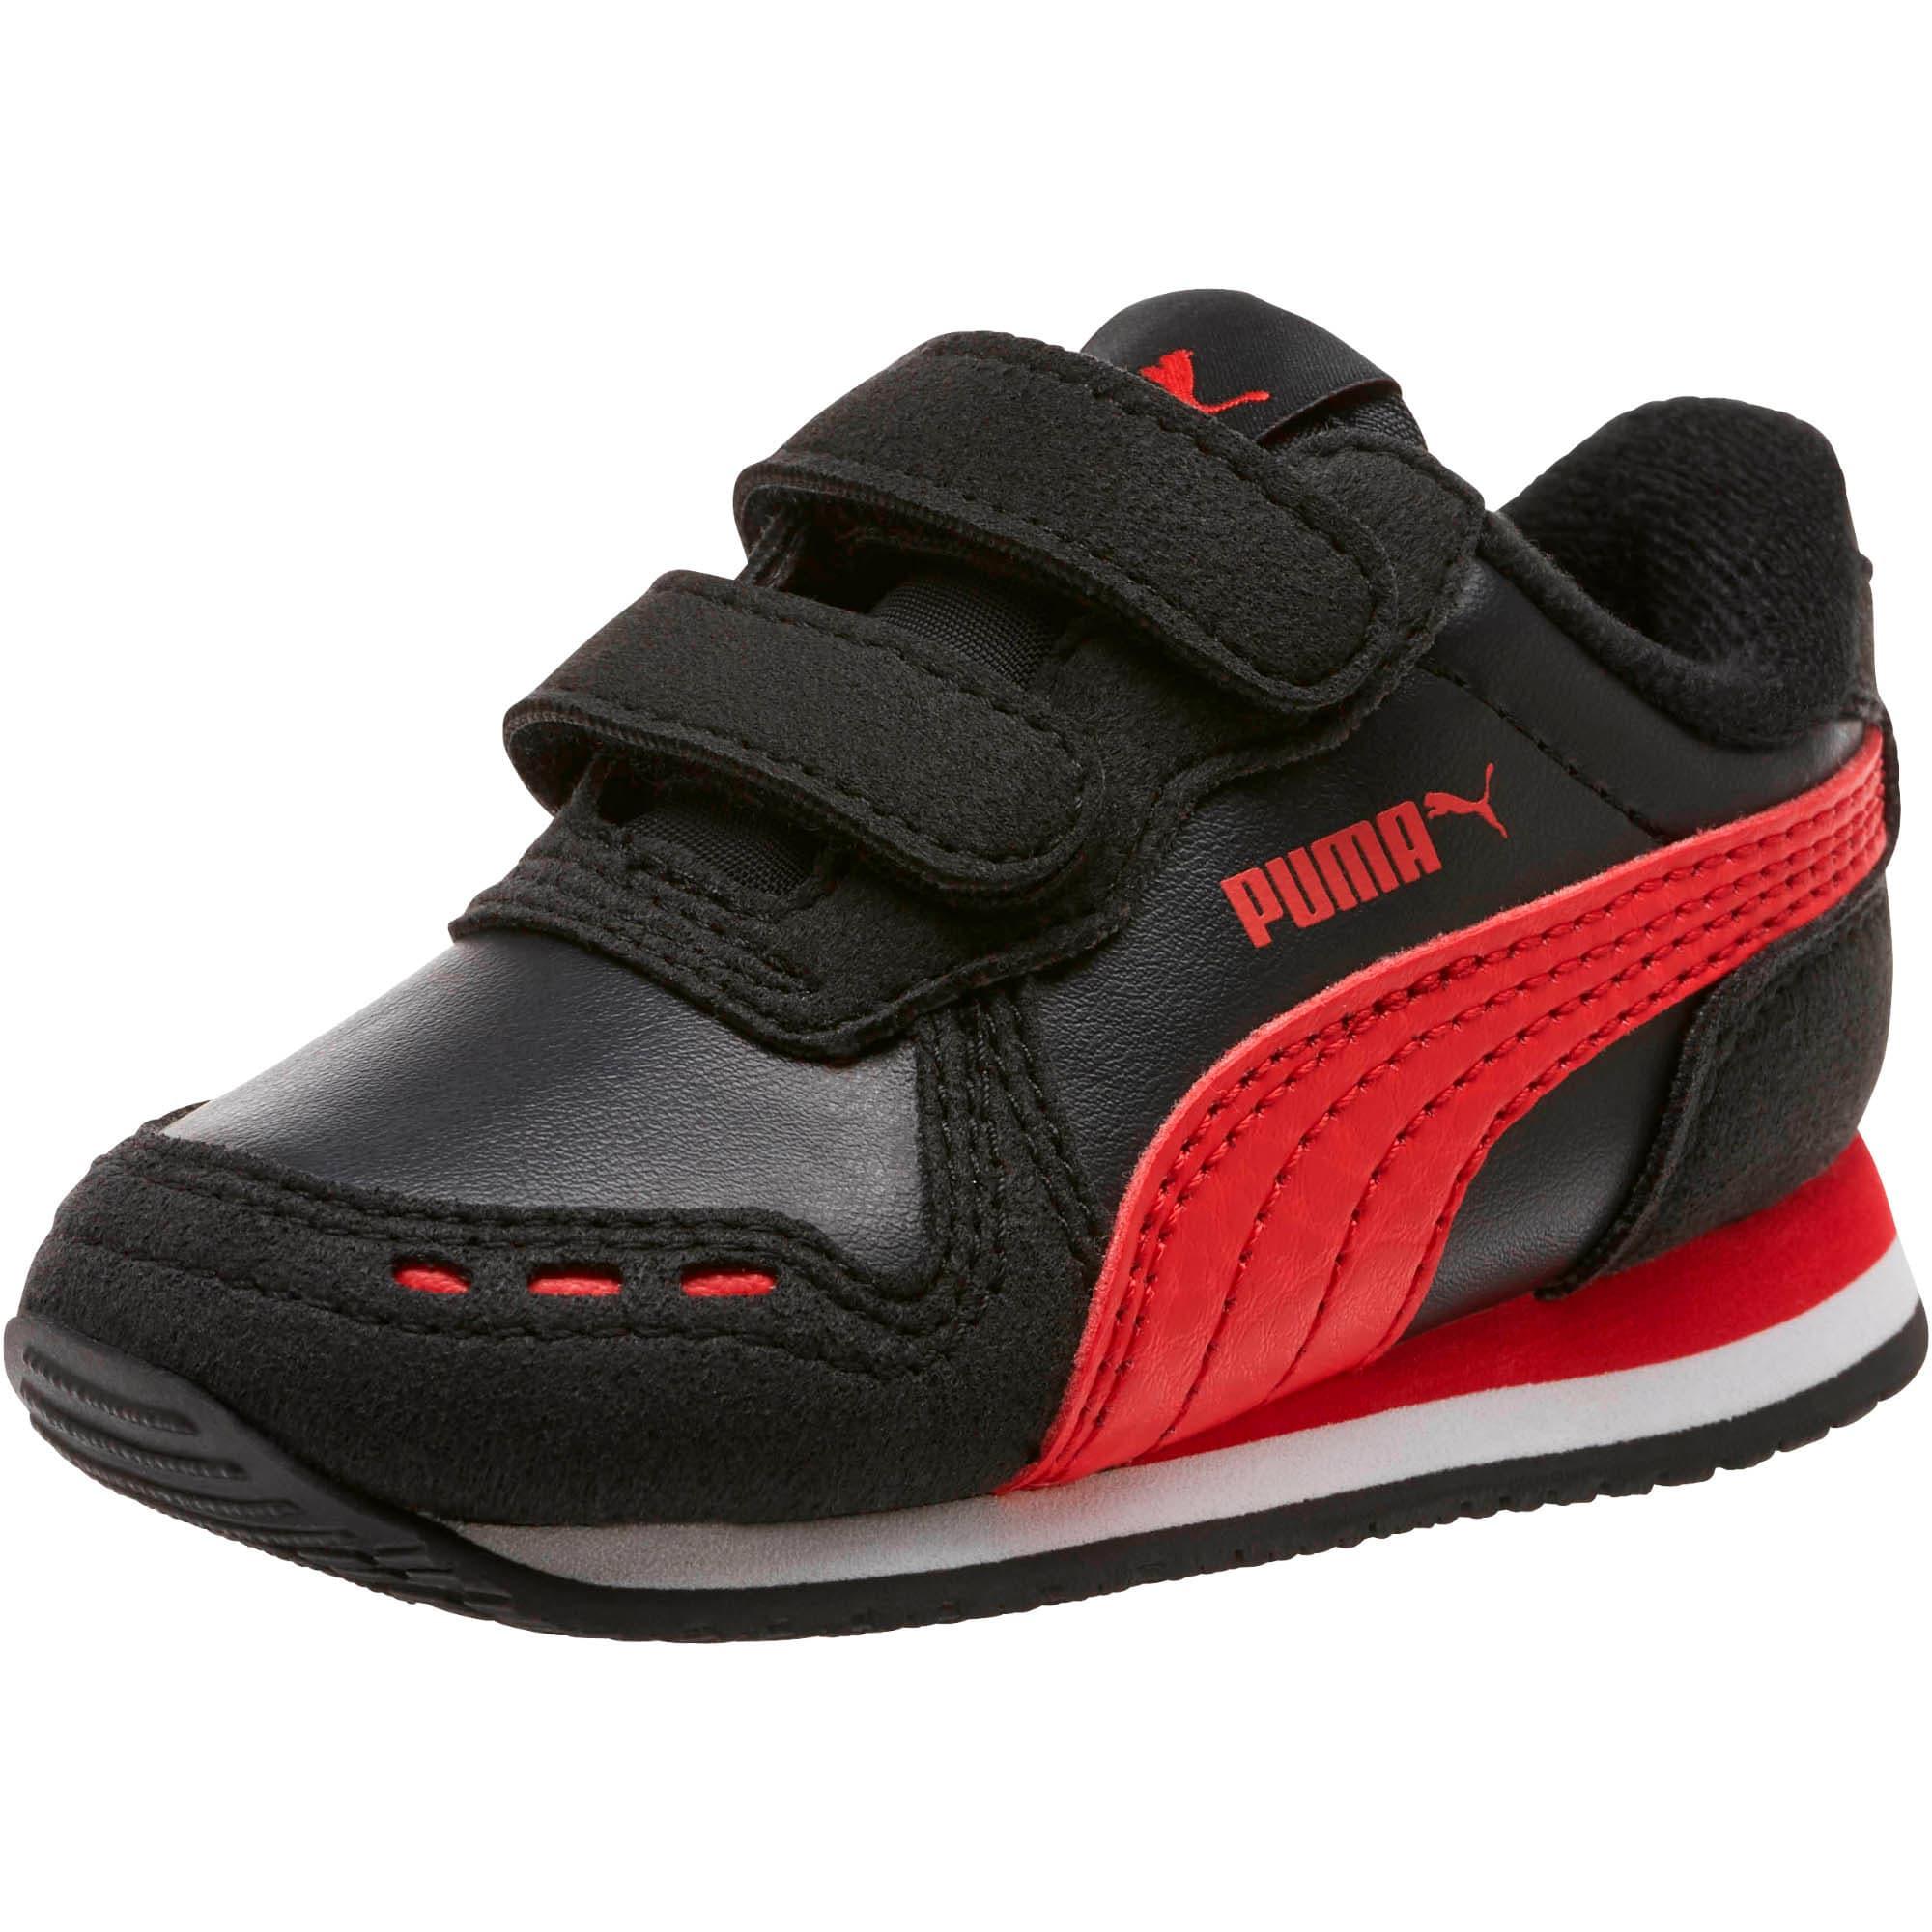 Thumbnail 1 of Cabana Racer SL Toddler Shoes, Puma Black-High Risk Red, medium